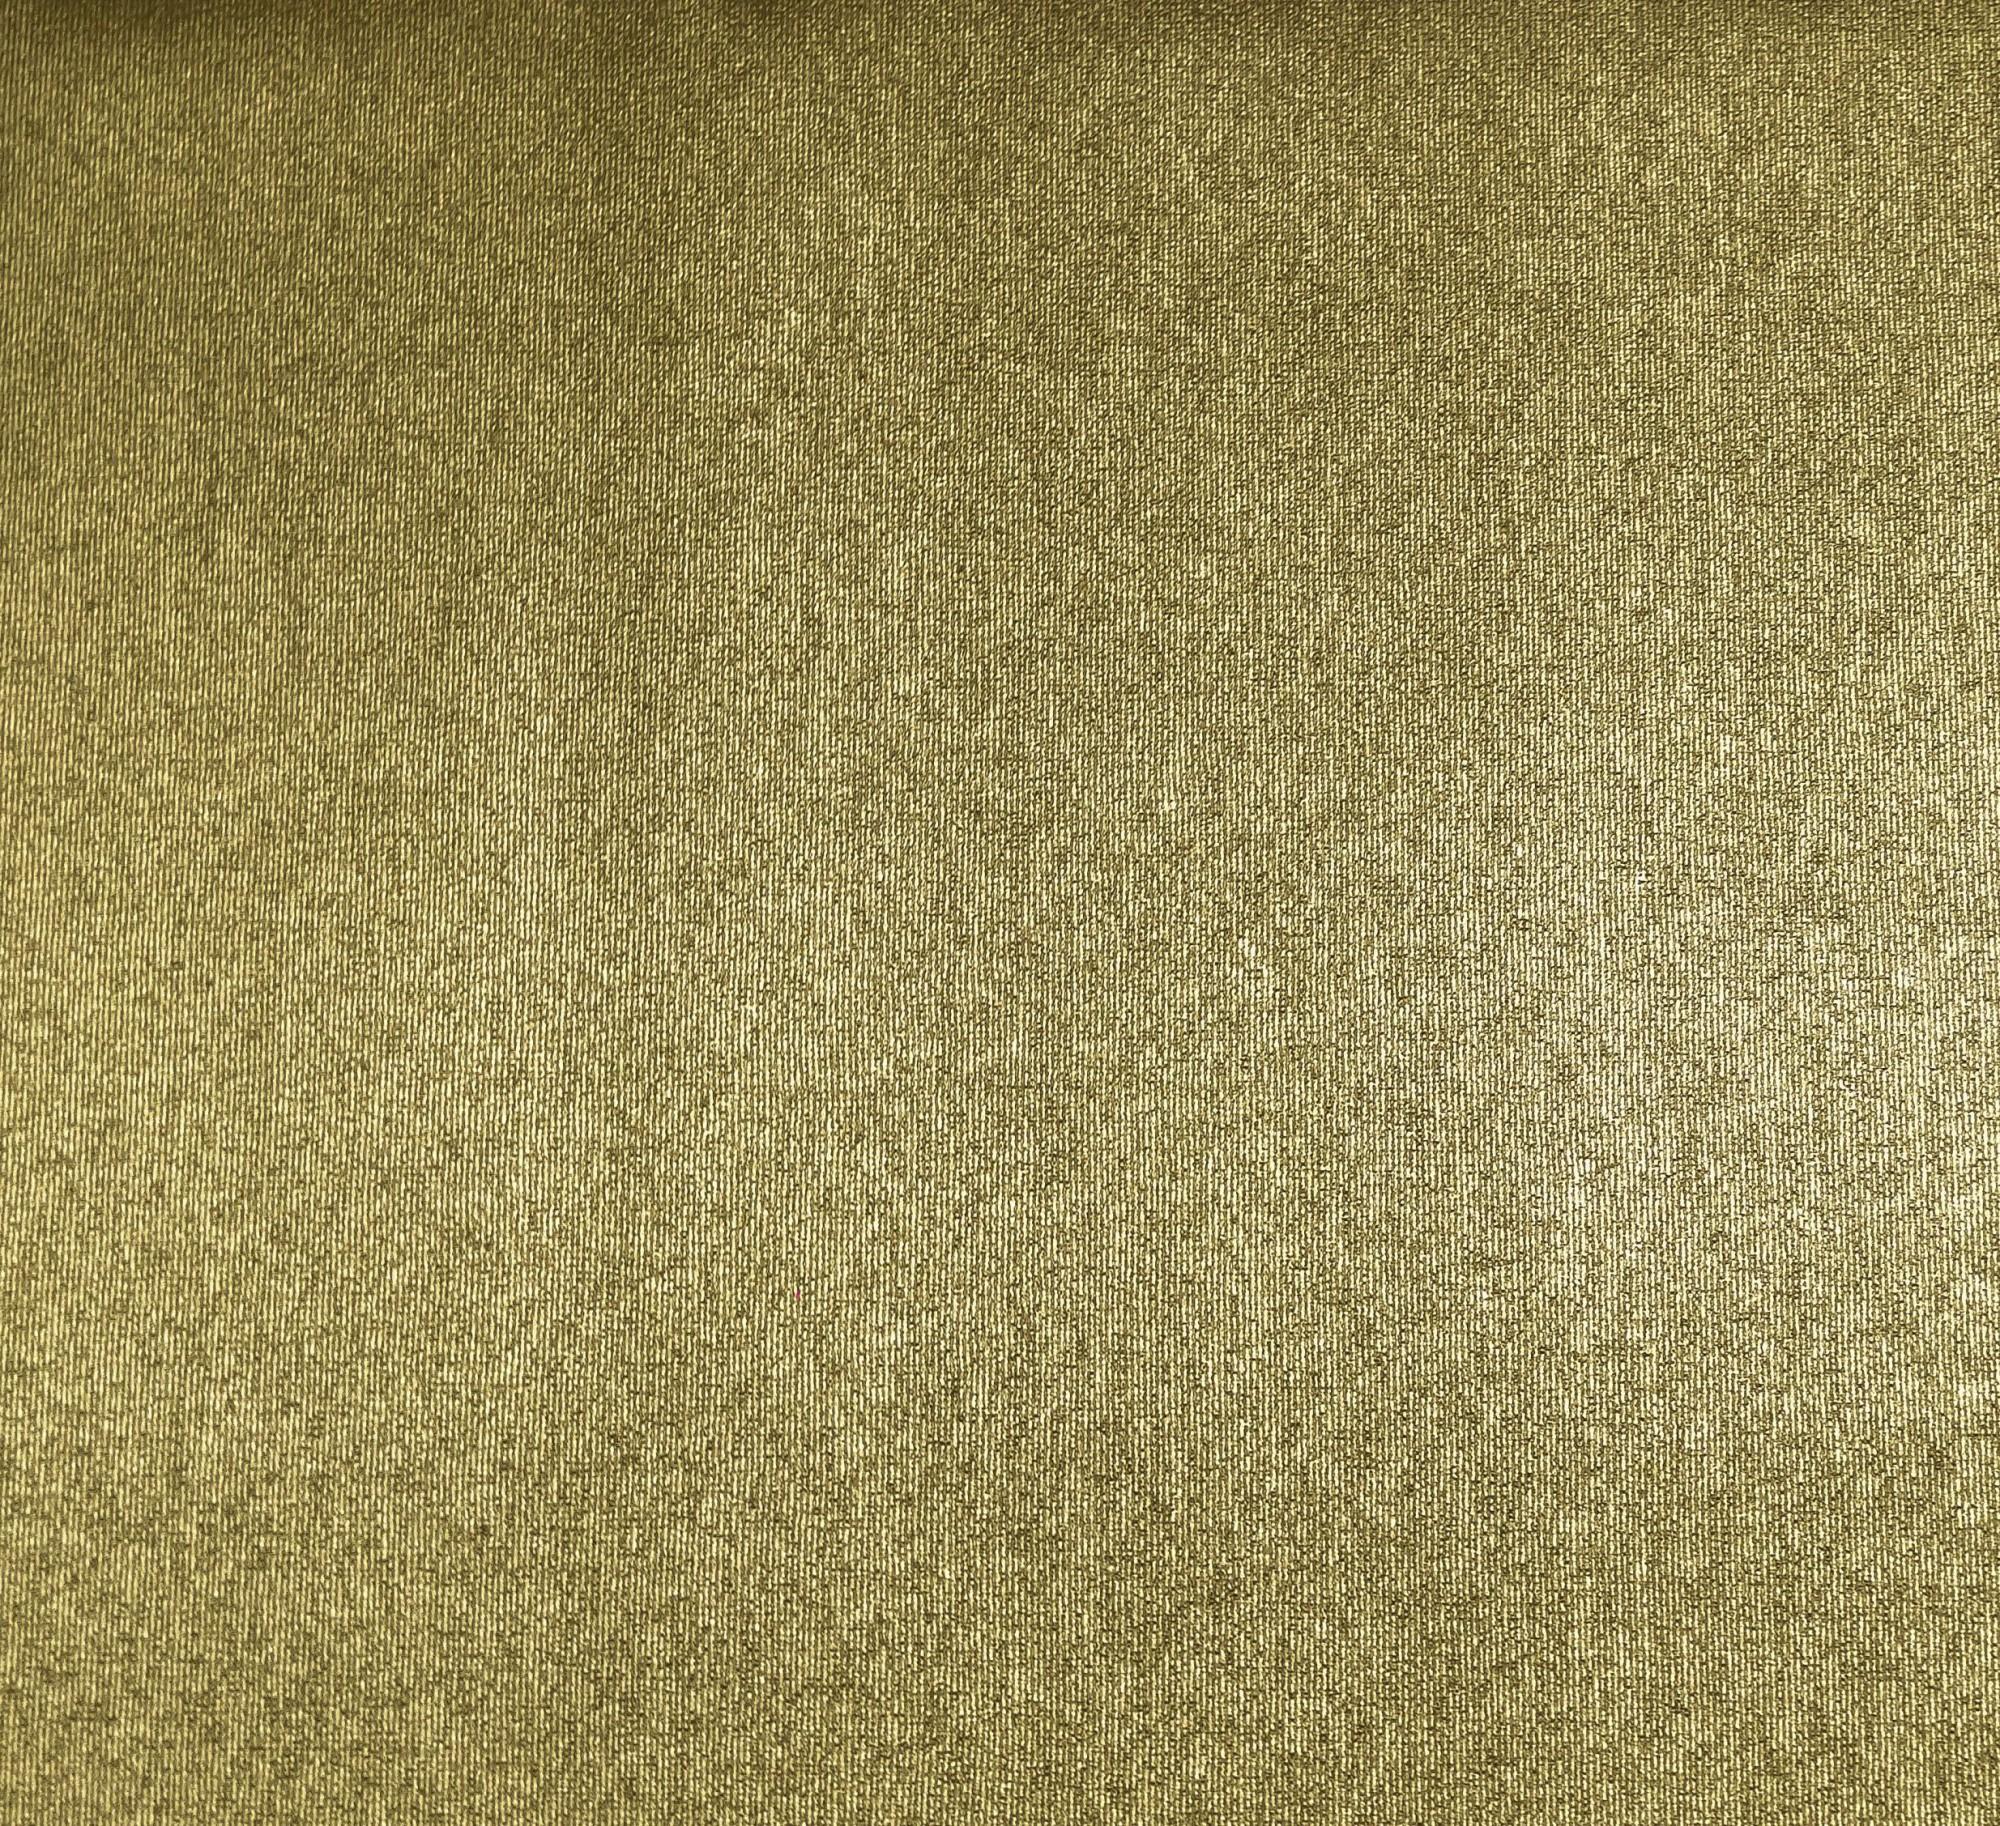 marburg designtapete karim rashid tapete 51946 uni gold metallic. Black Bedroom Furniture Sets. Home Design Ideas